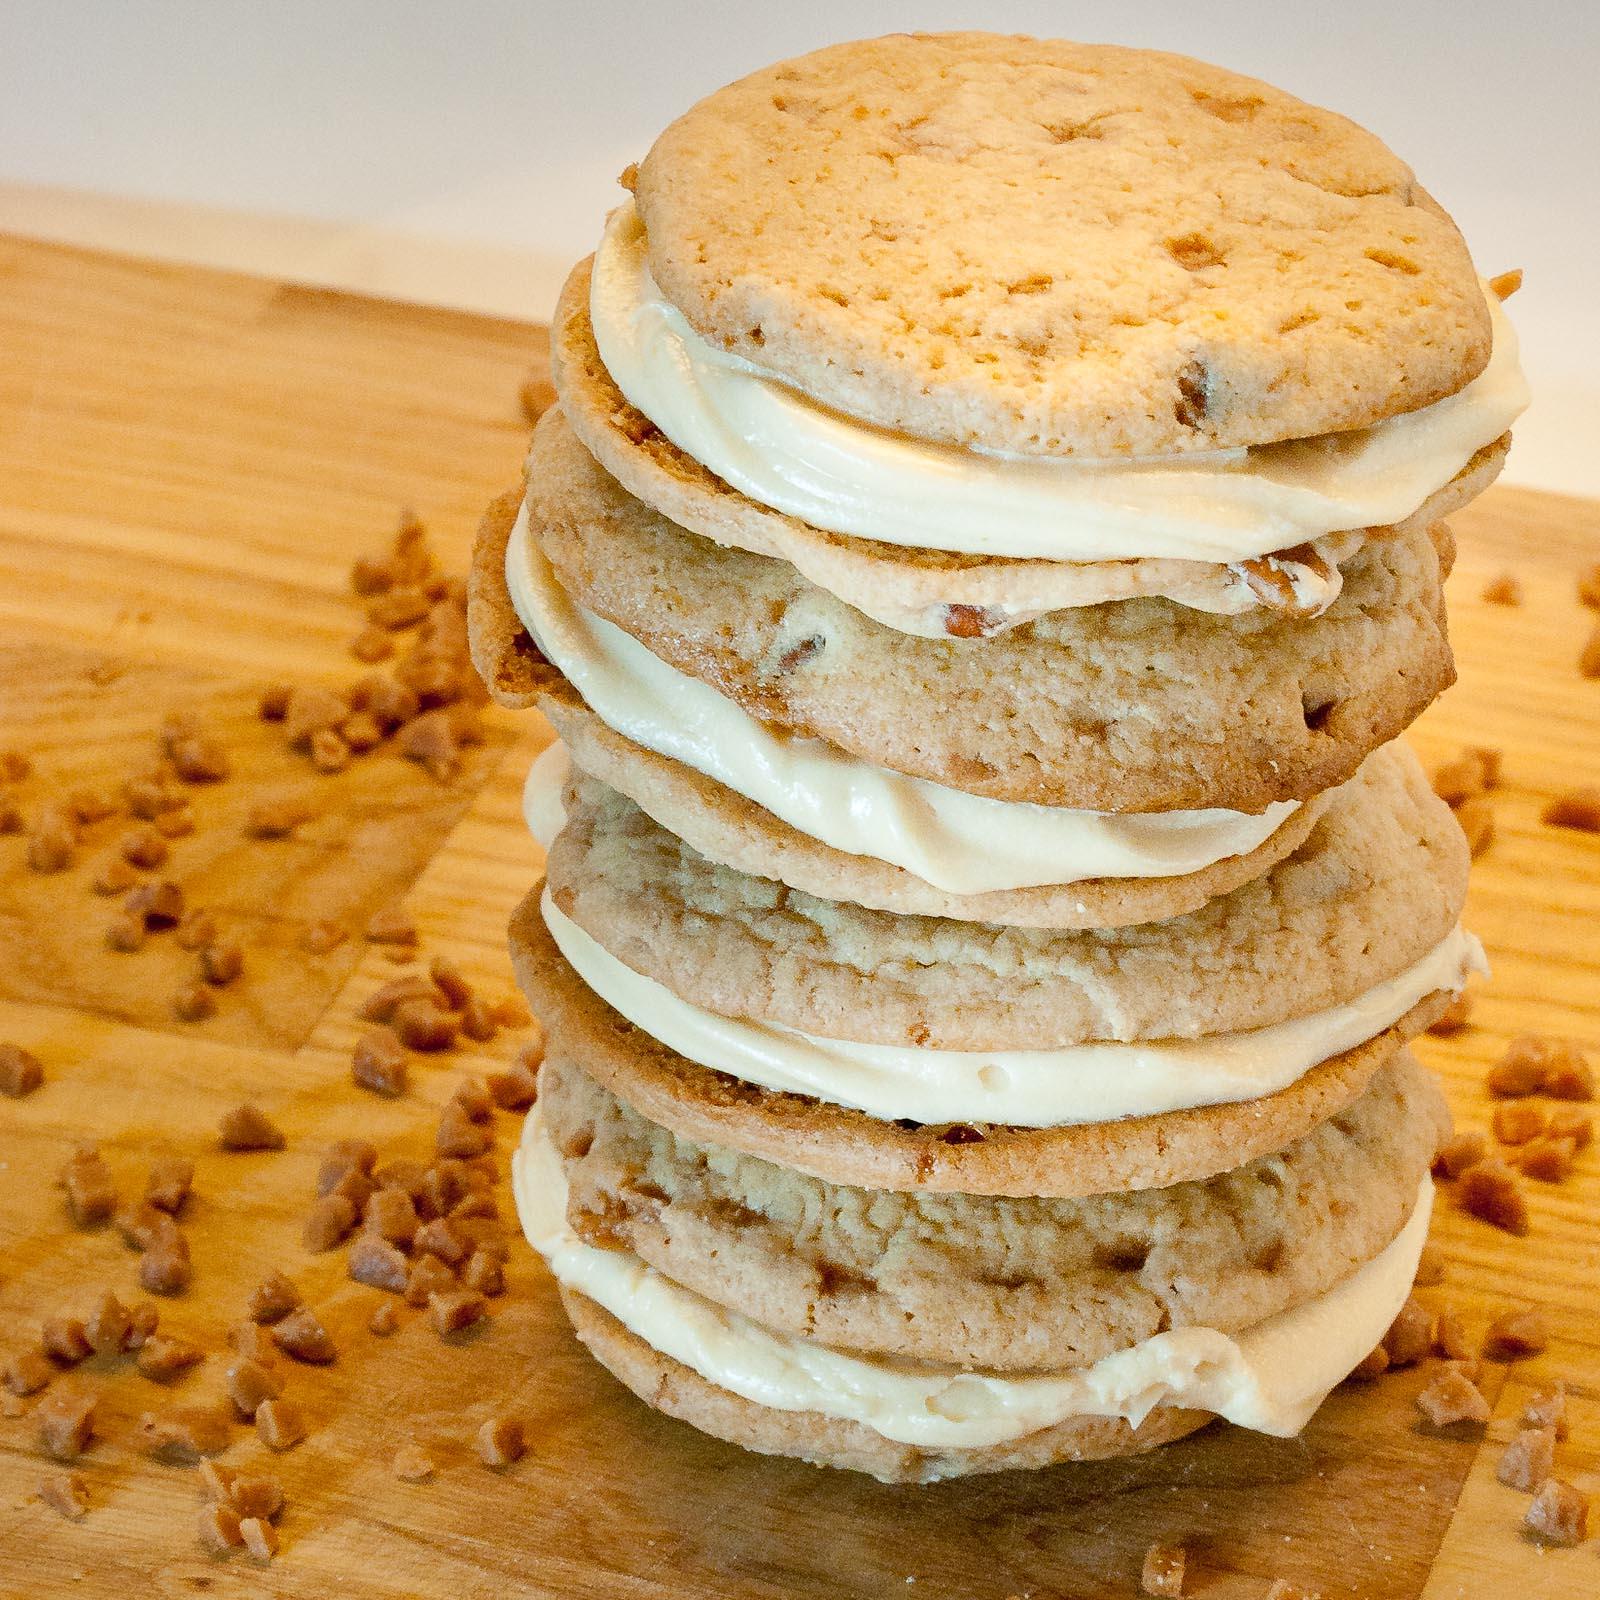 Sweet Twist of Blogging: Butter Pecan Wookie Pies